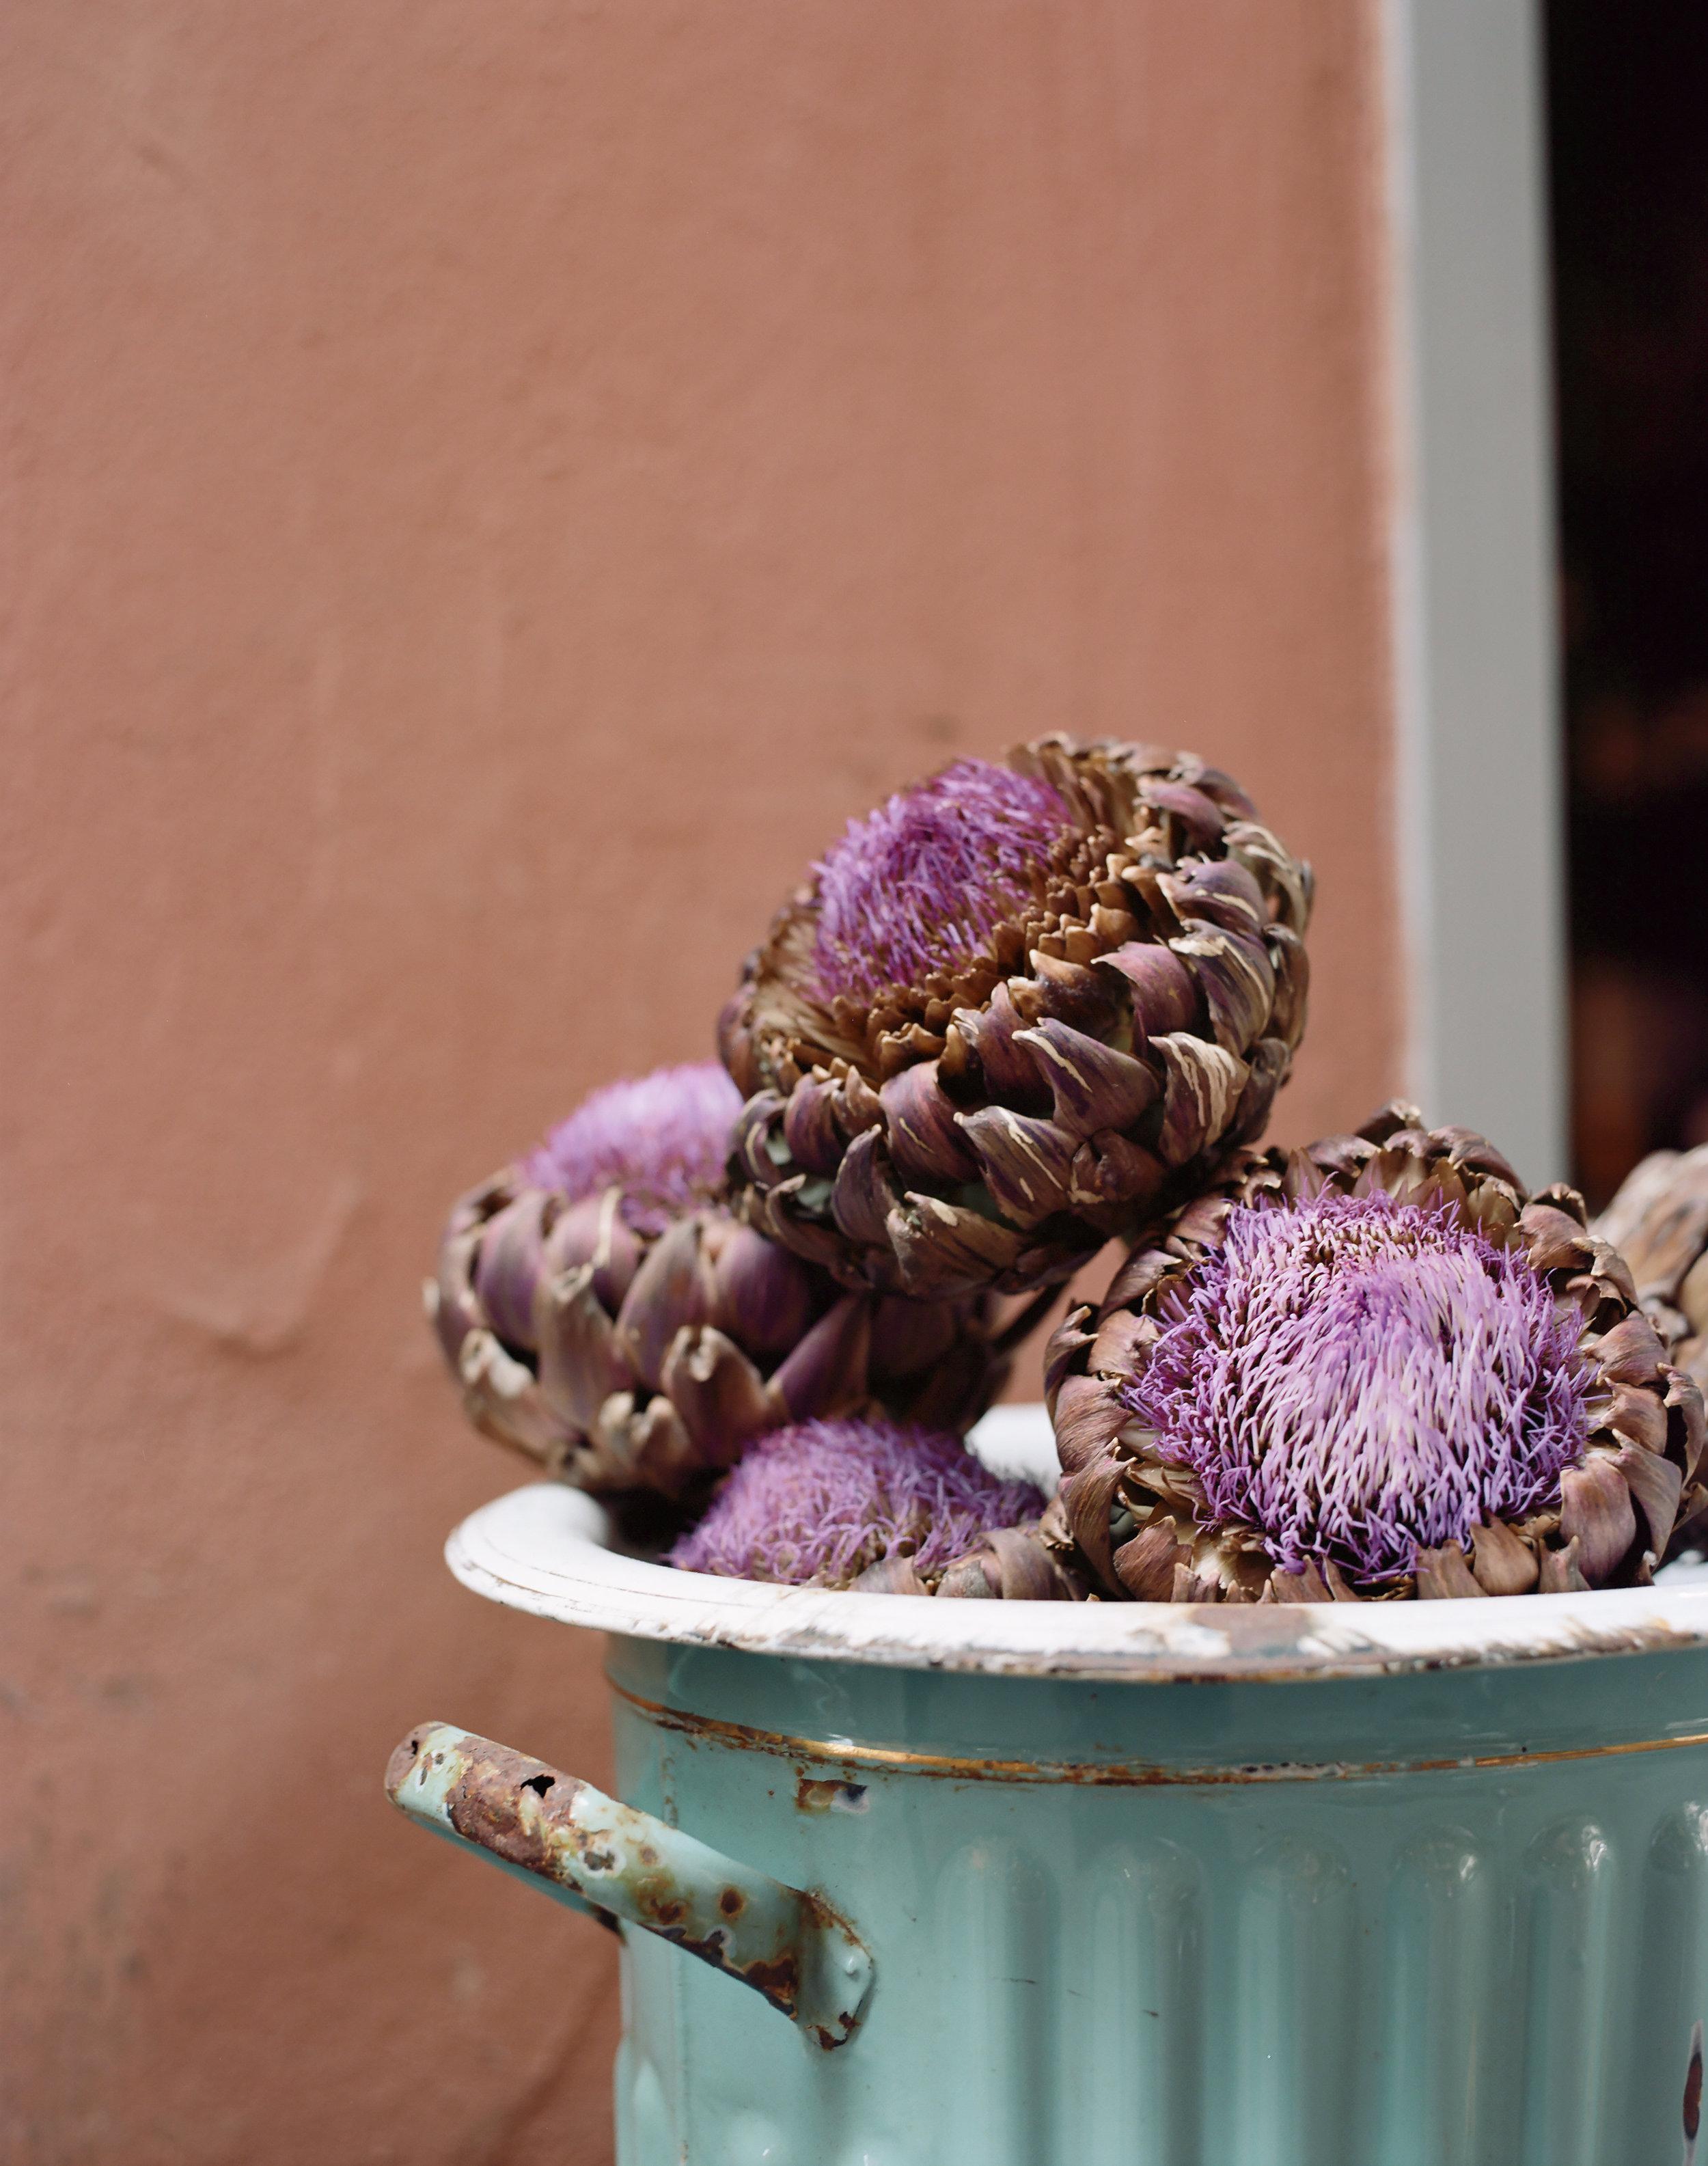 Flowering Artichoke Decoration